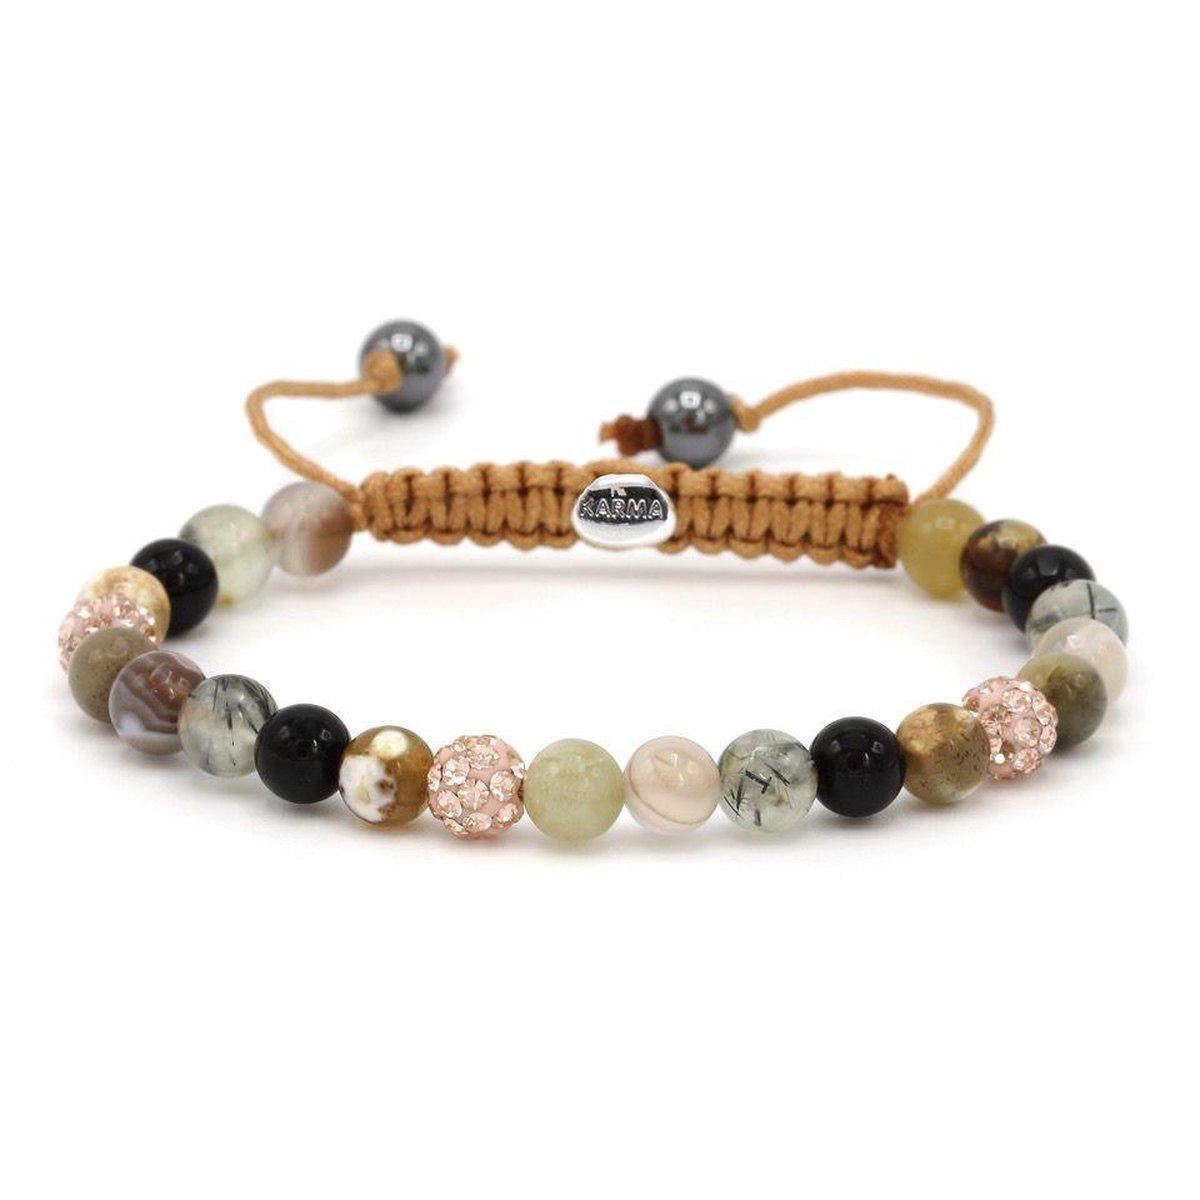 Karma Armband 83470 Spiral Imagination XS (Rose Crystal)